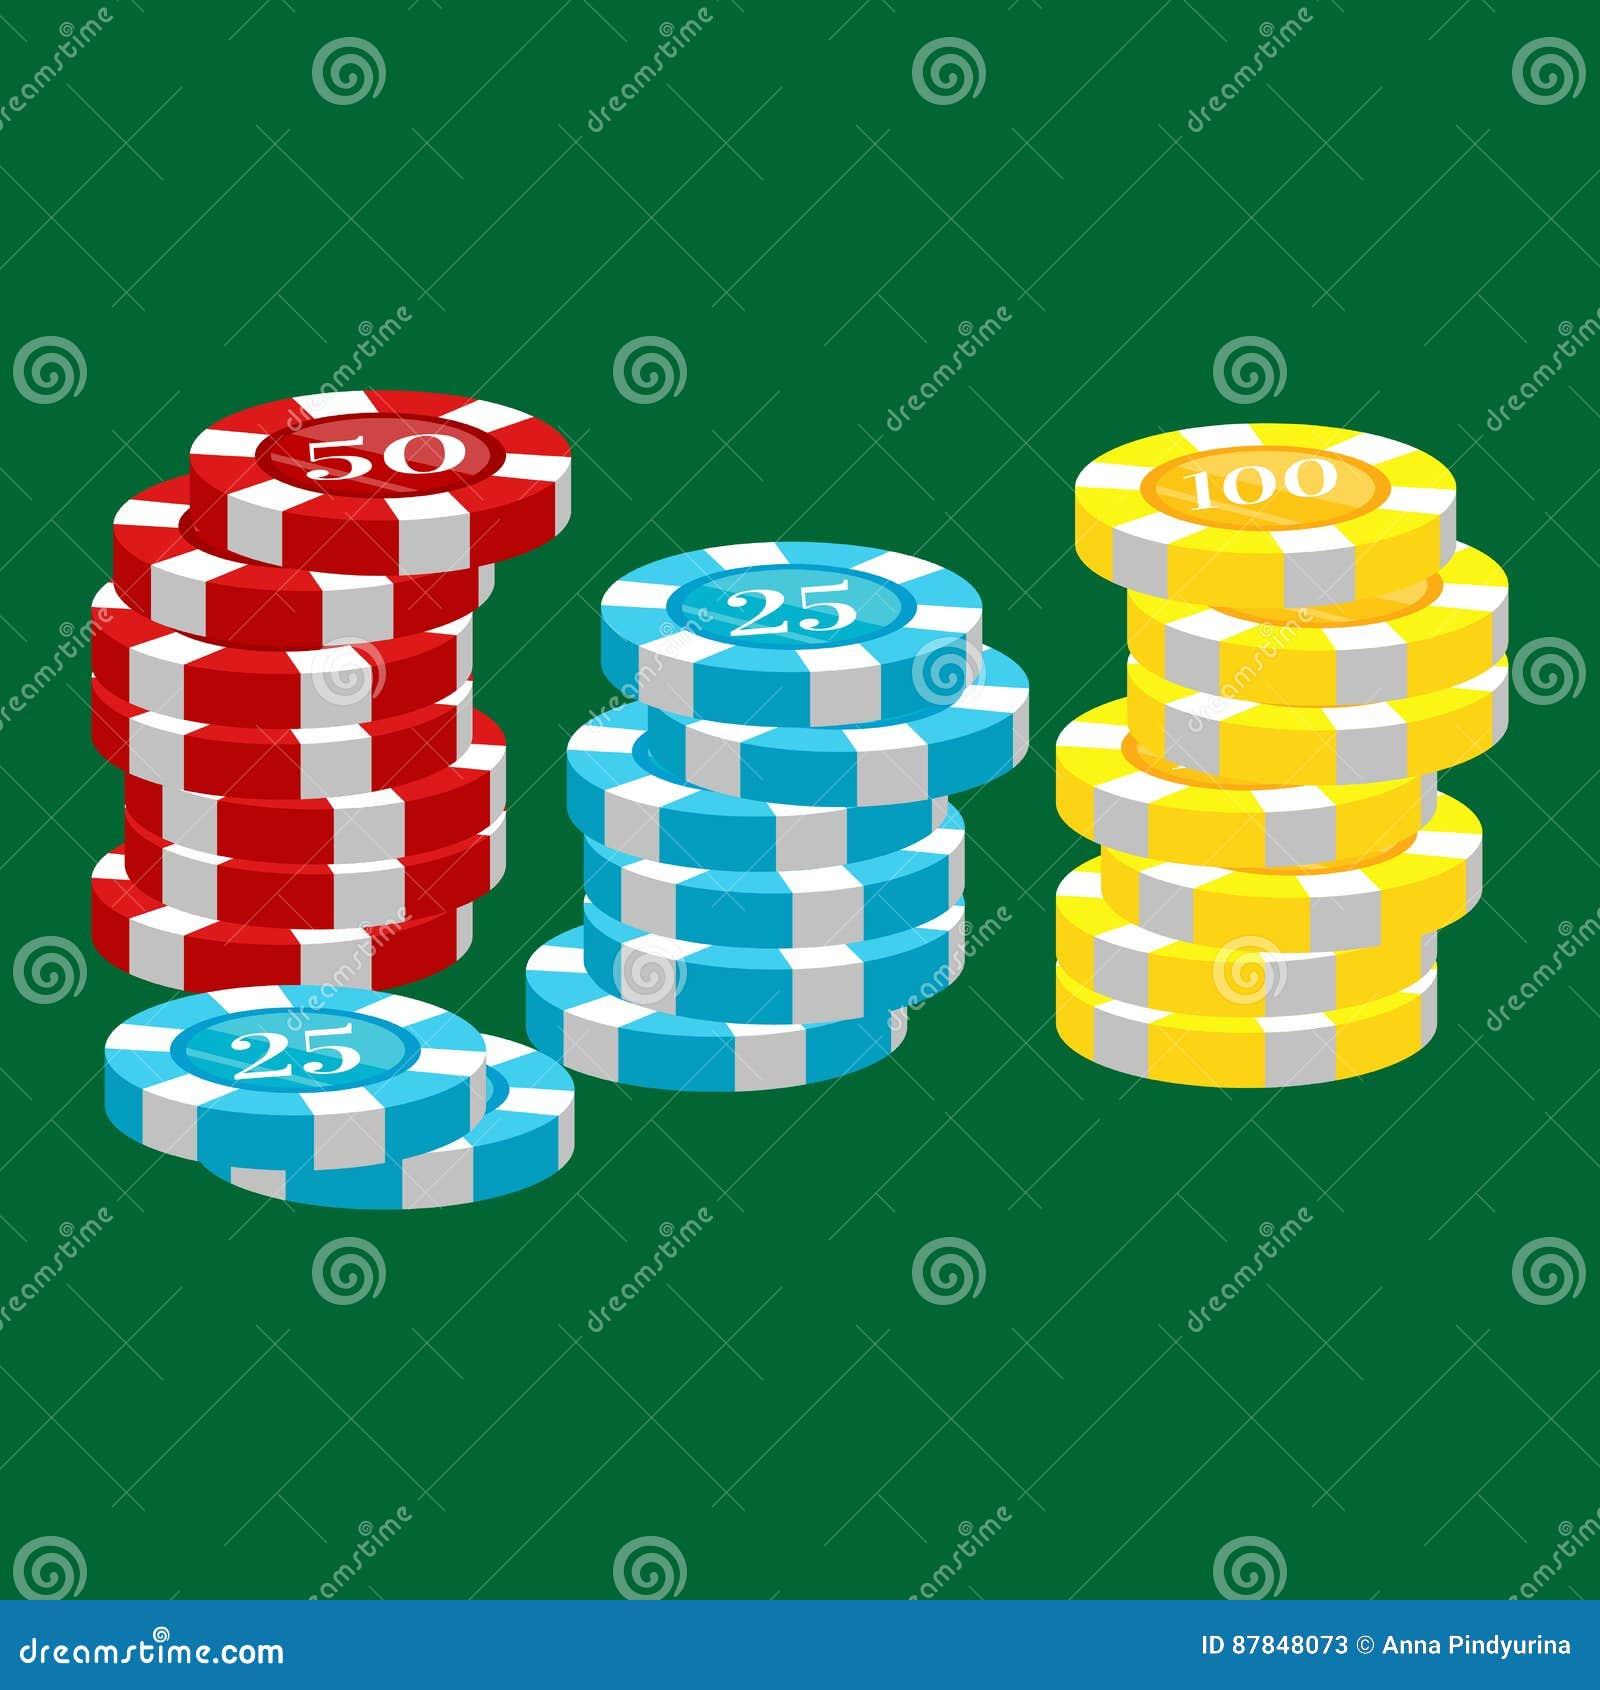 Работа в казино на кипре